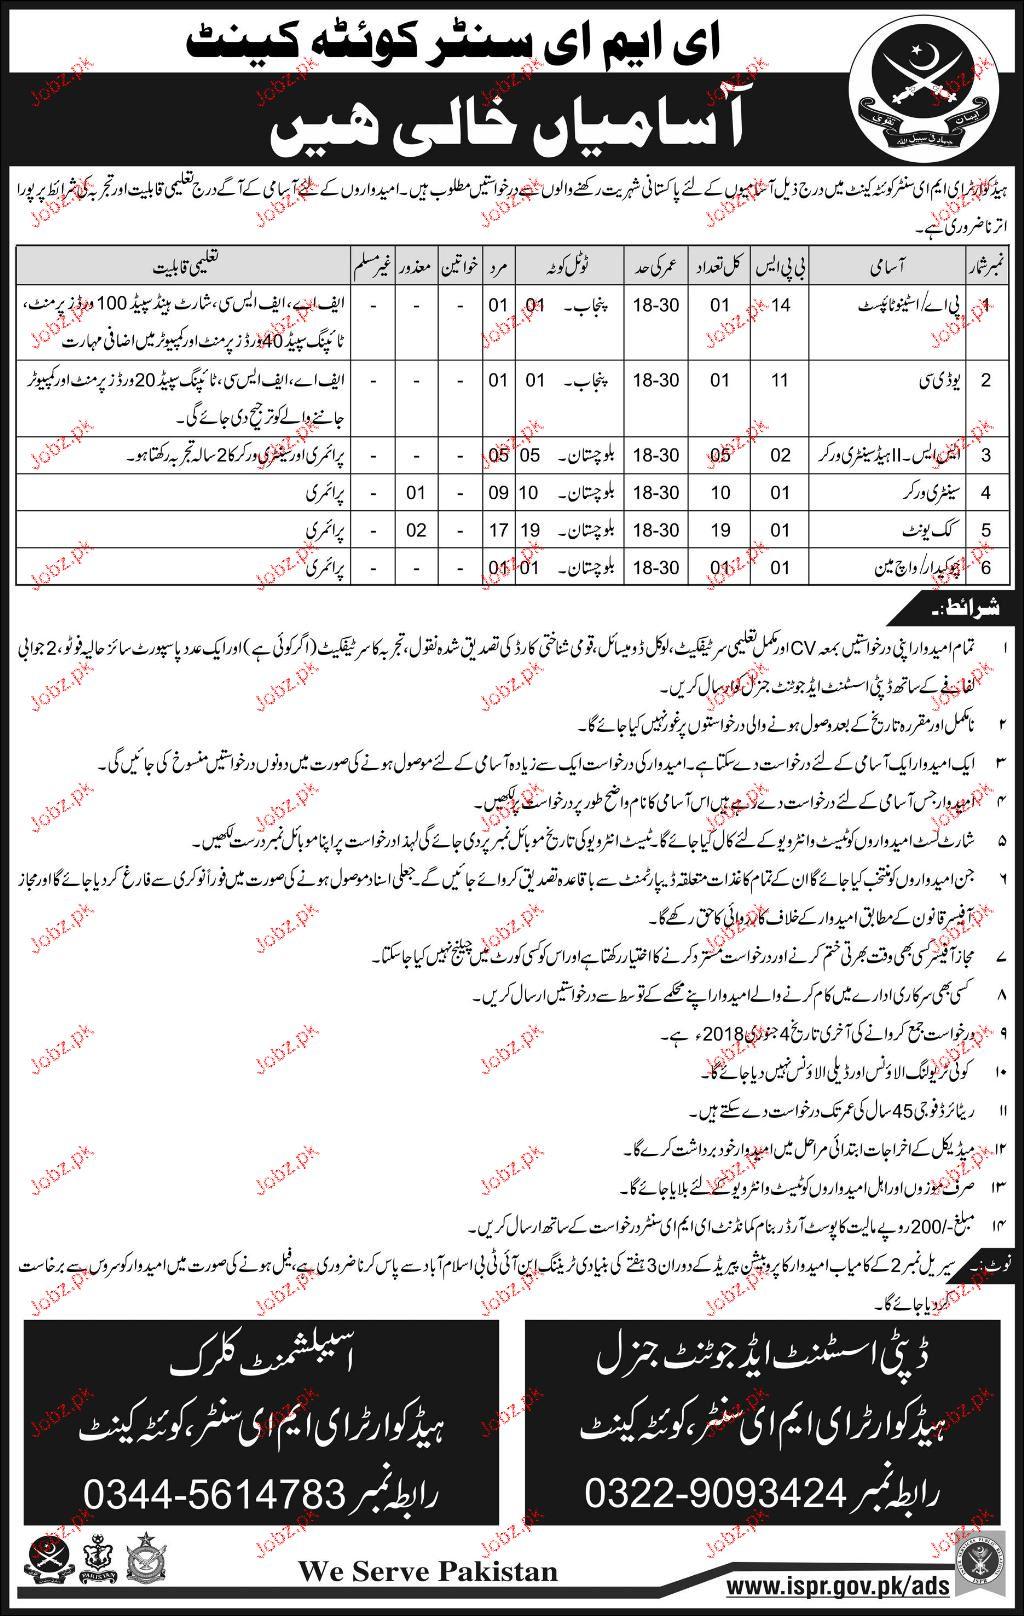 Headquarter EME Center Quetta Cant Jobs